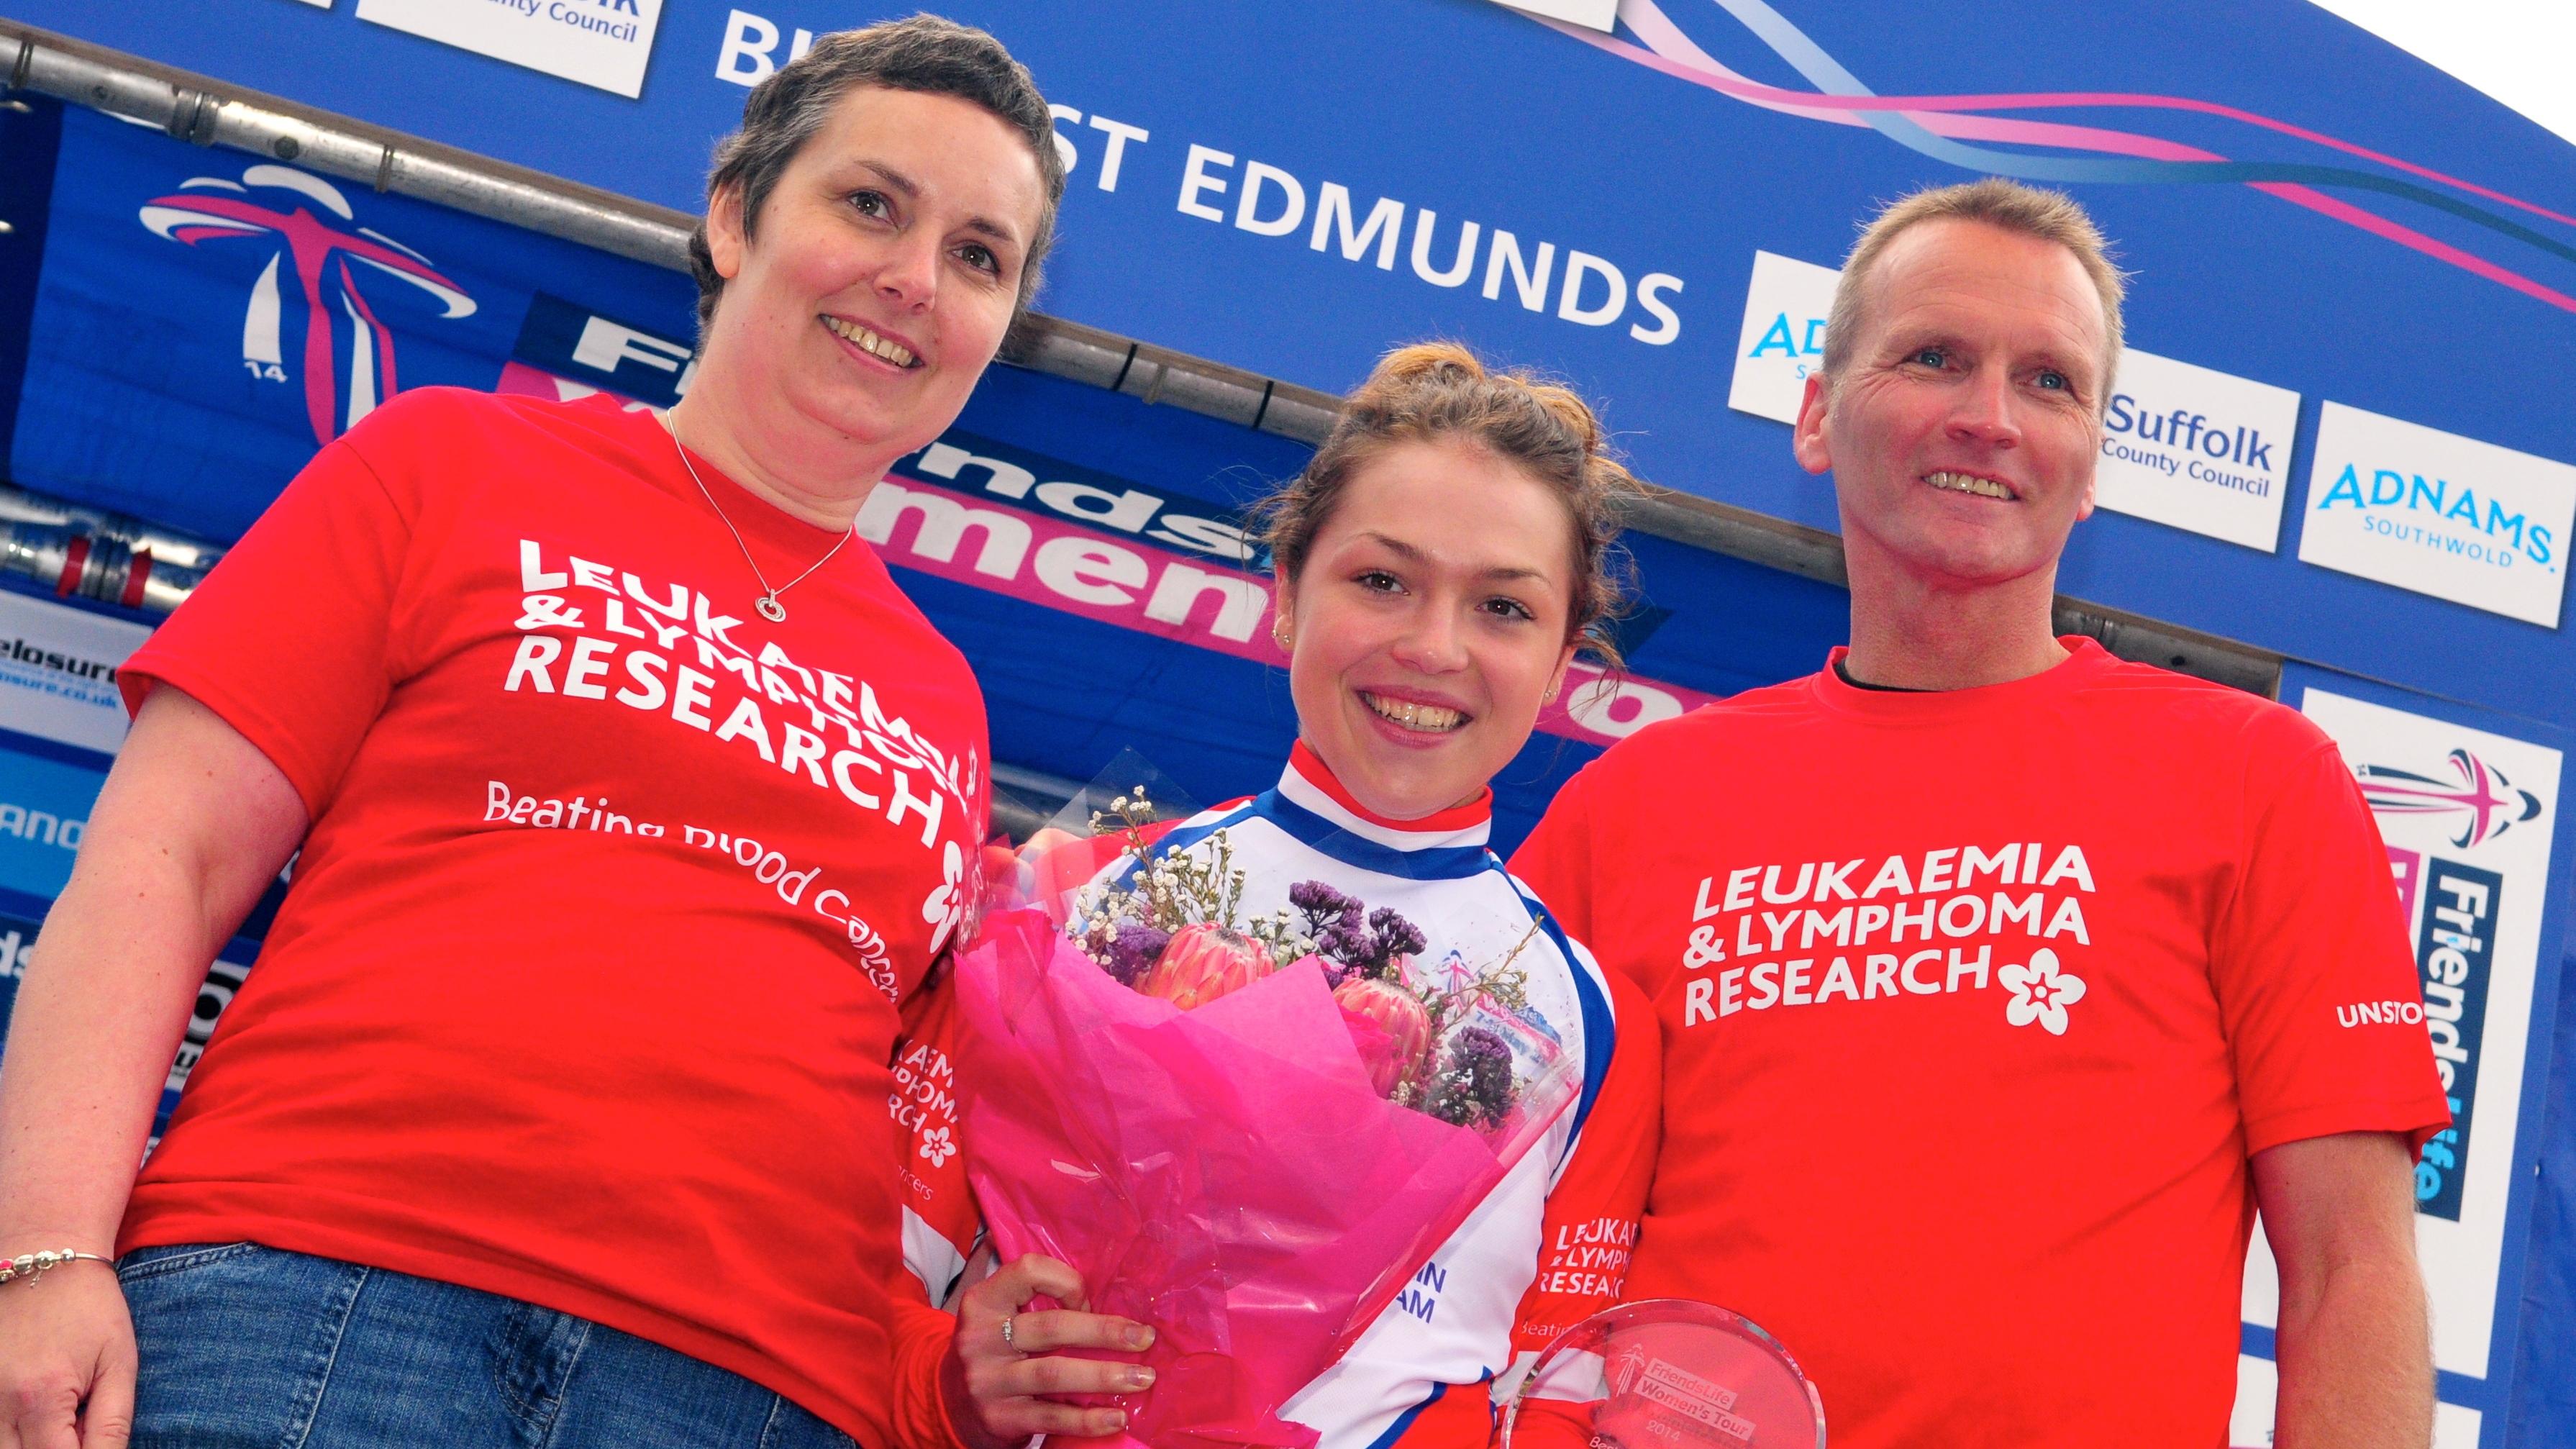 Leukaemia & Lymphoma Research announced as official charity partner